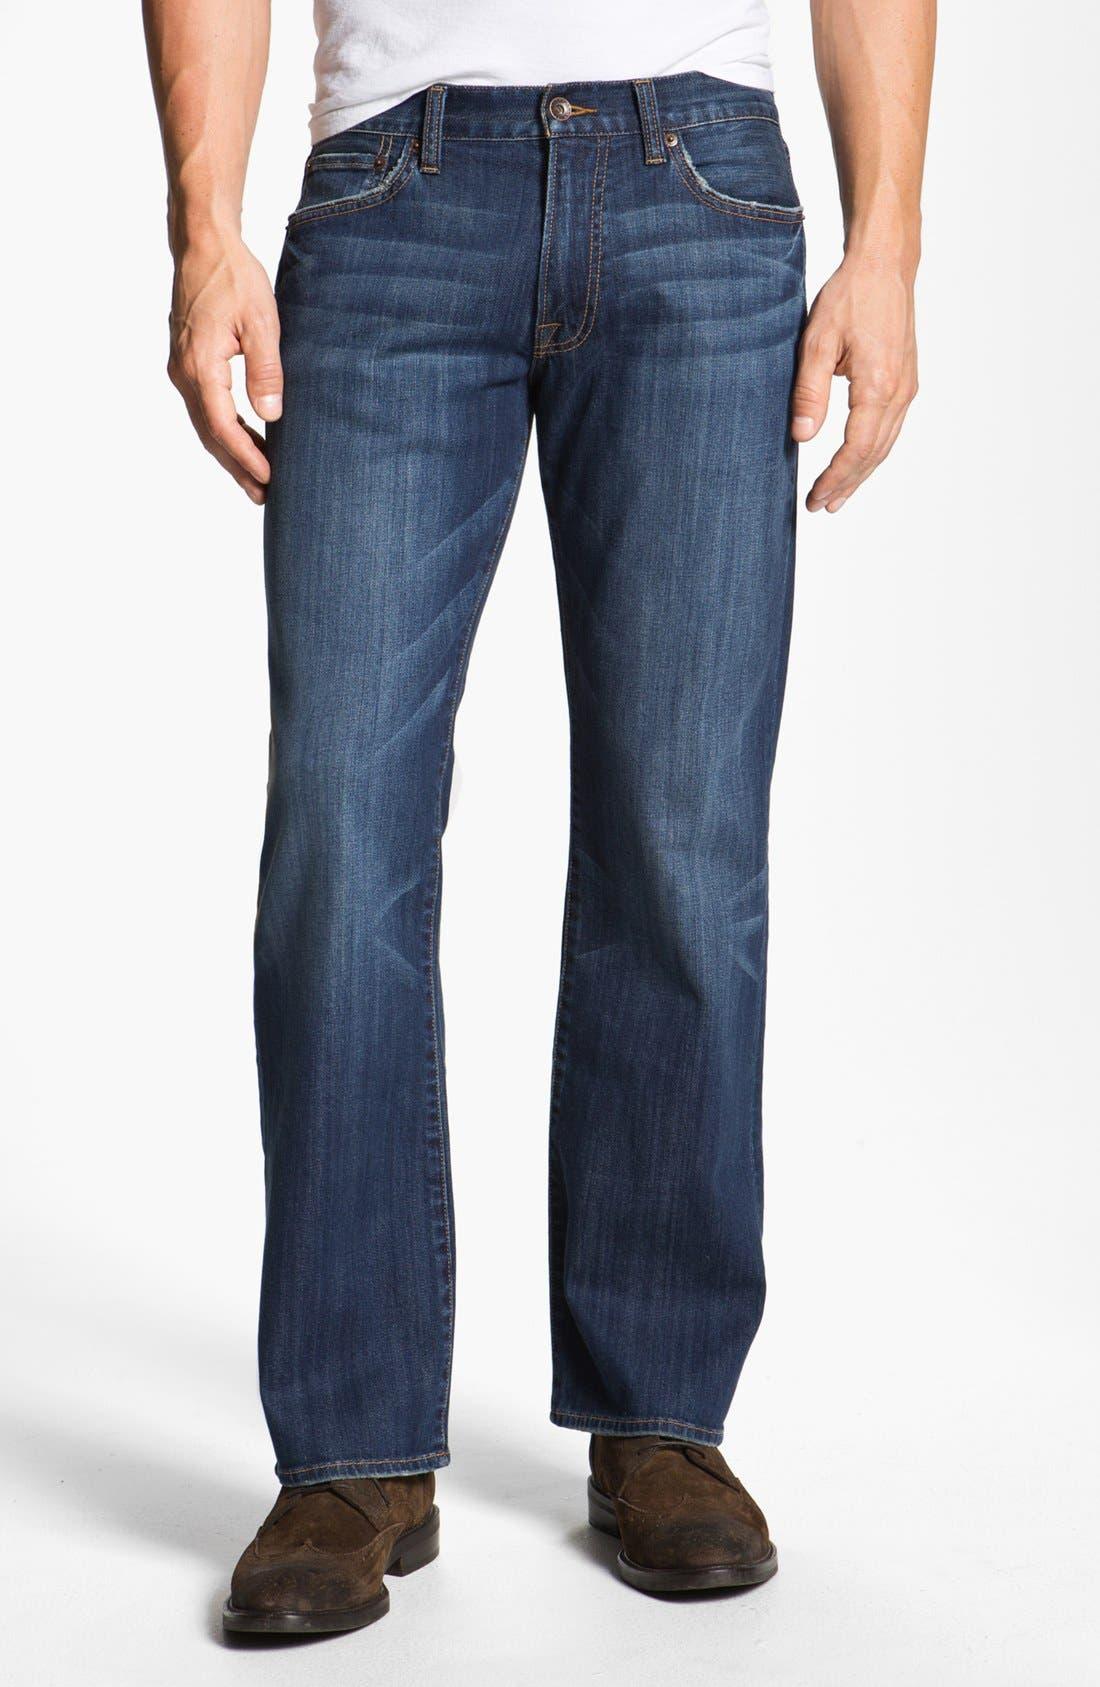 Alternate Image 1 Selected - Lucky Brand '361 Vintage' Straight leg Jeans (Erwin)